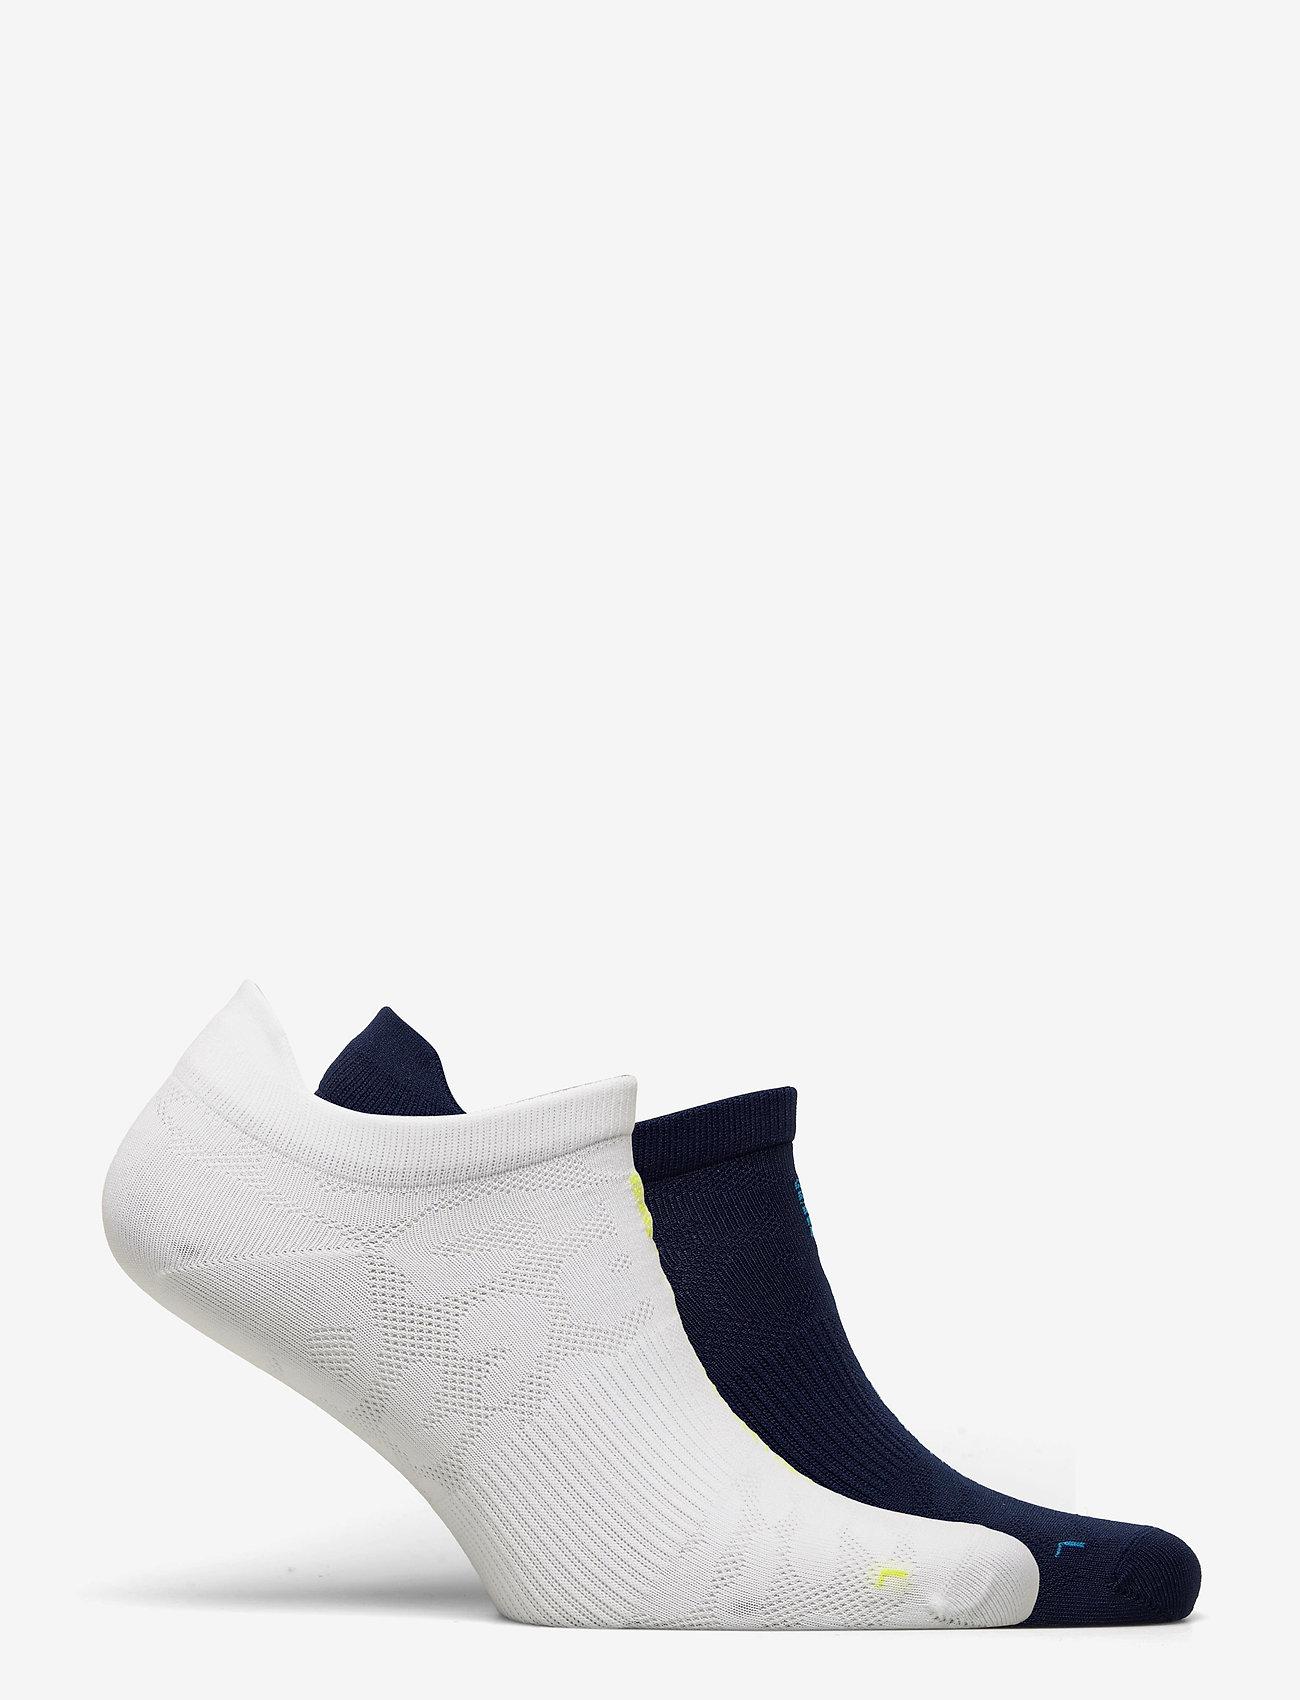 adidas by Stella McCartney - aSMC SOCKS - ankelstrumpor - white/aciyel/conavy/b - 1